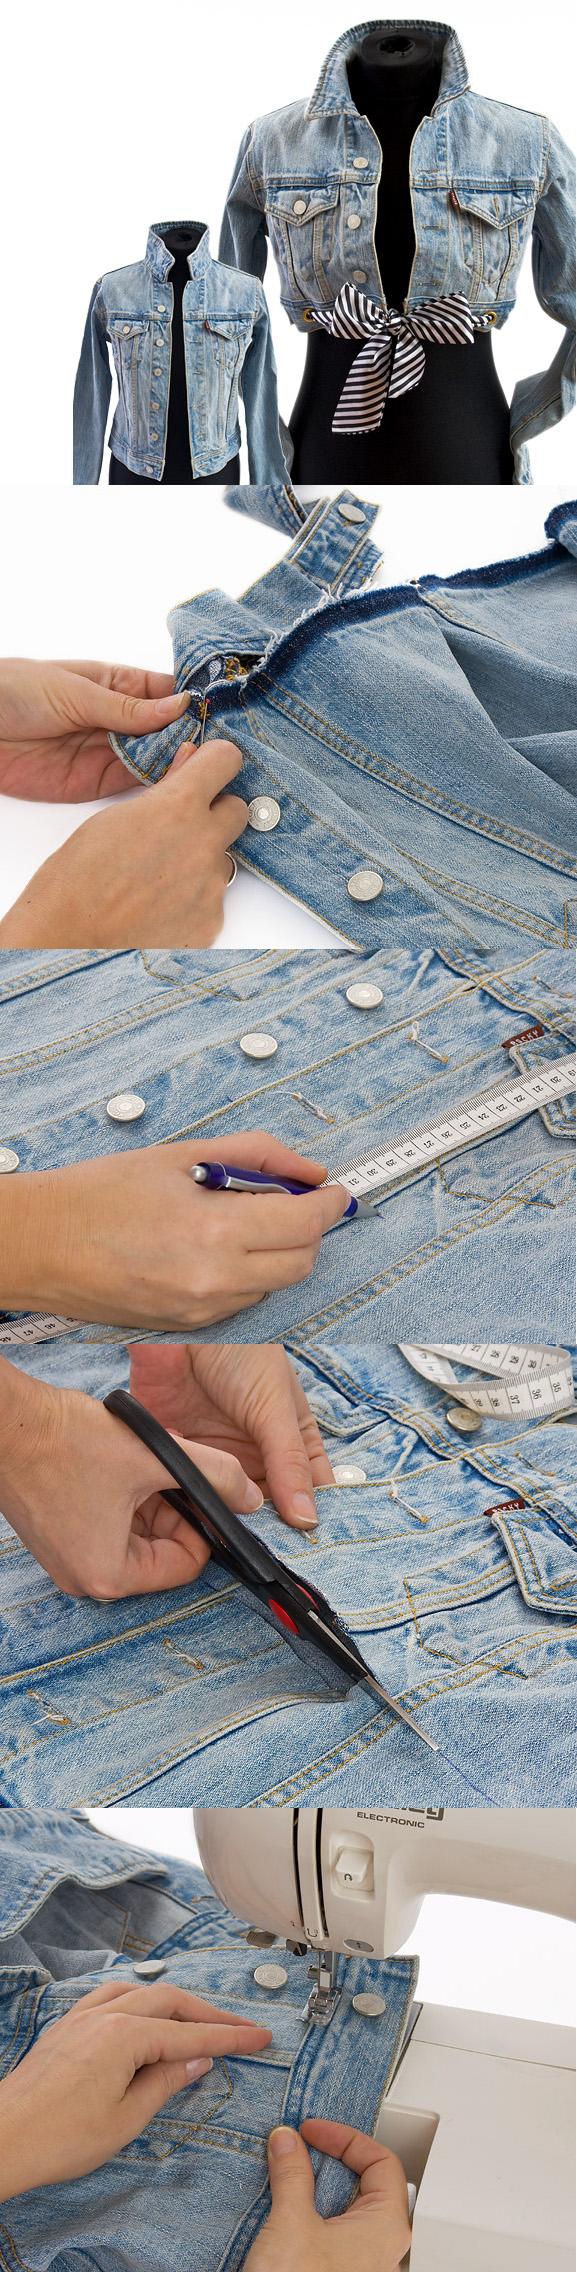 Clothing Tutorials DIY jacket